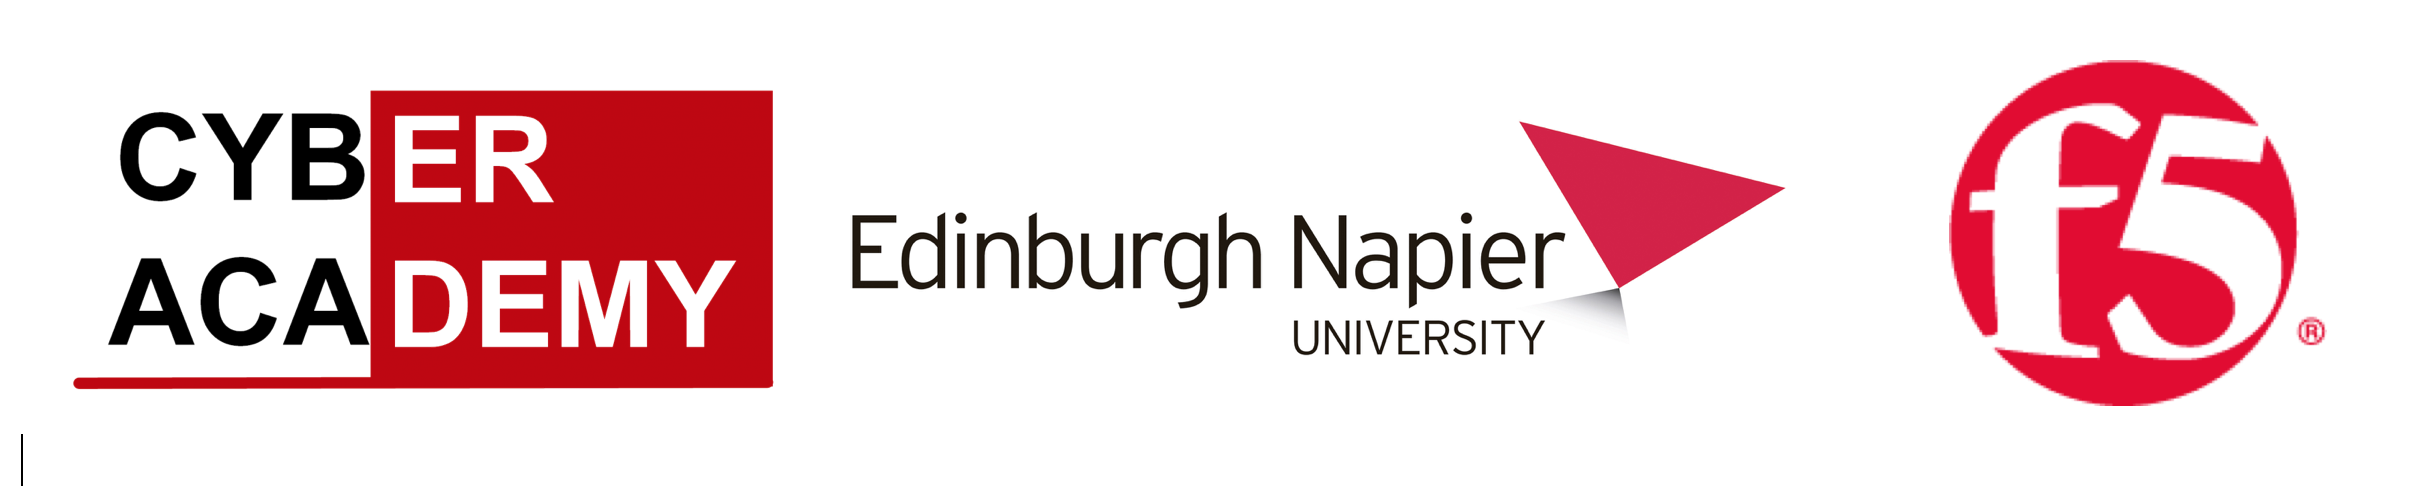 The Cyber Academy / Edinburgh Napier University / F5